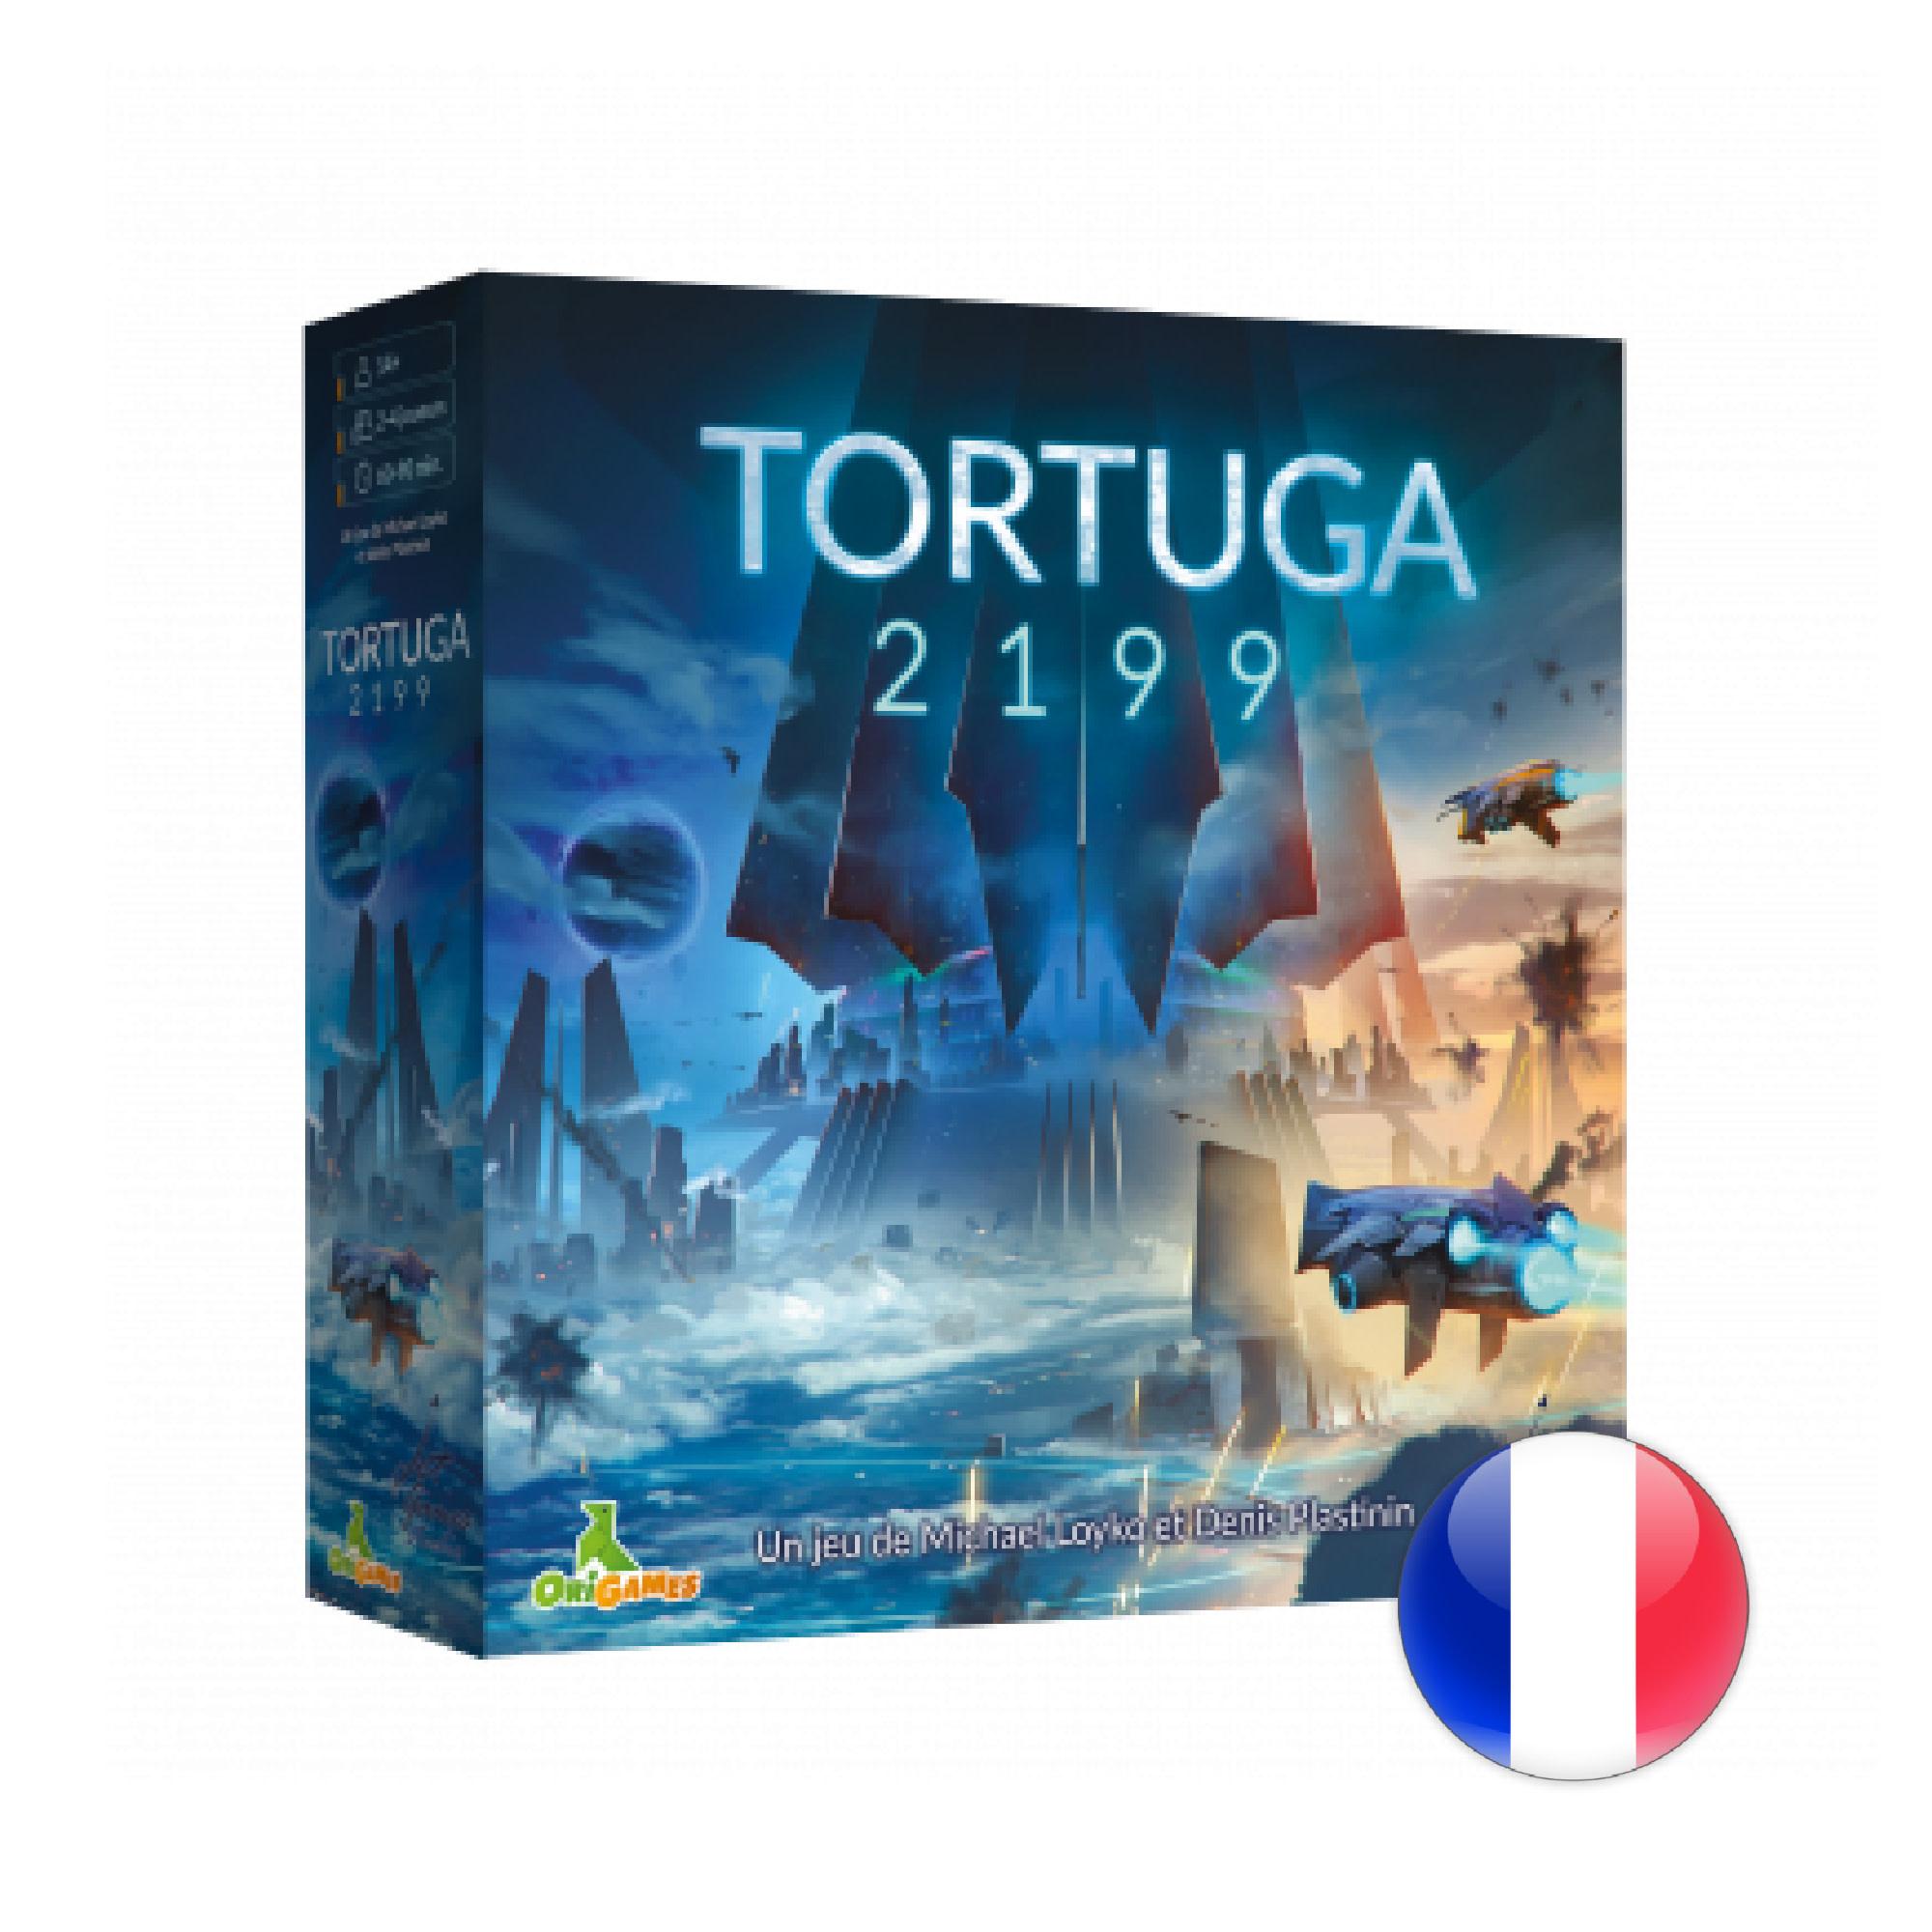 Origames Tortuga 2199